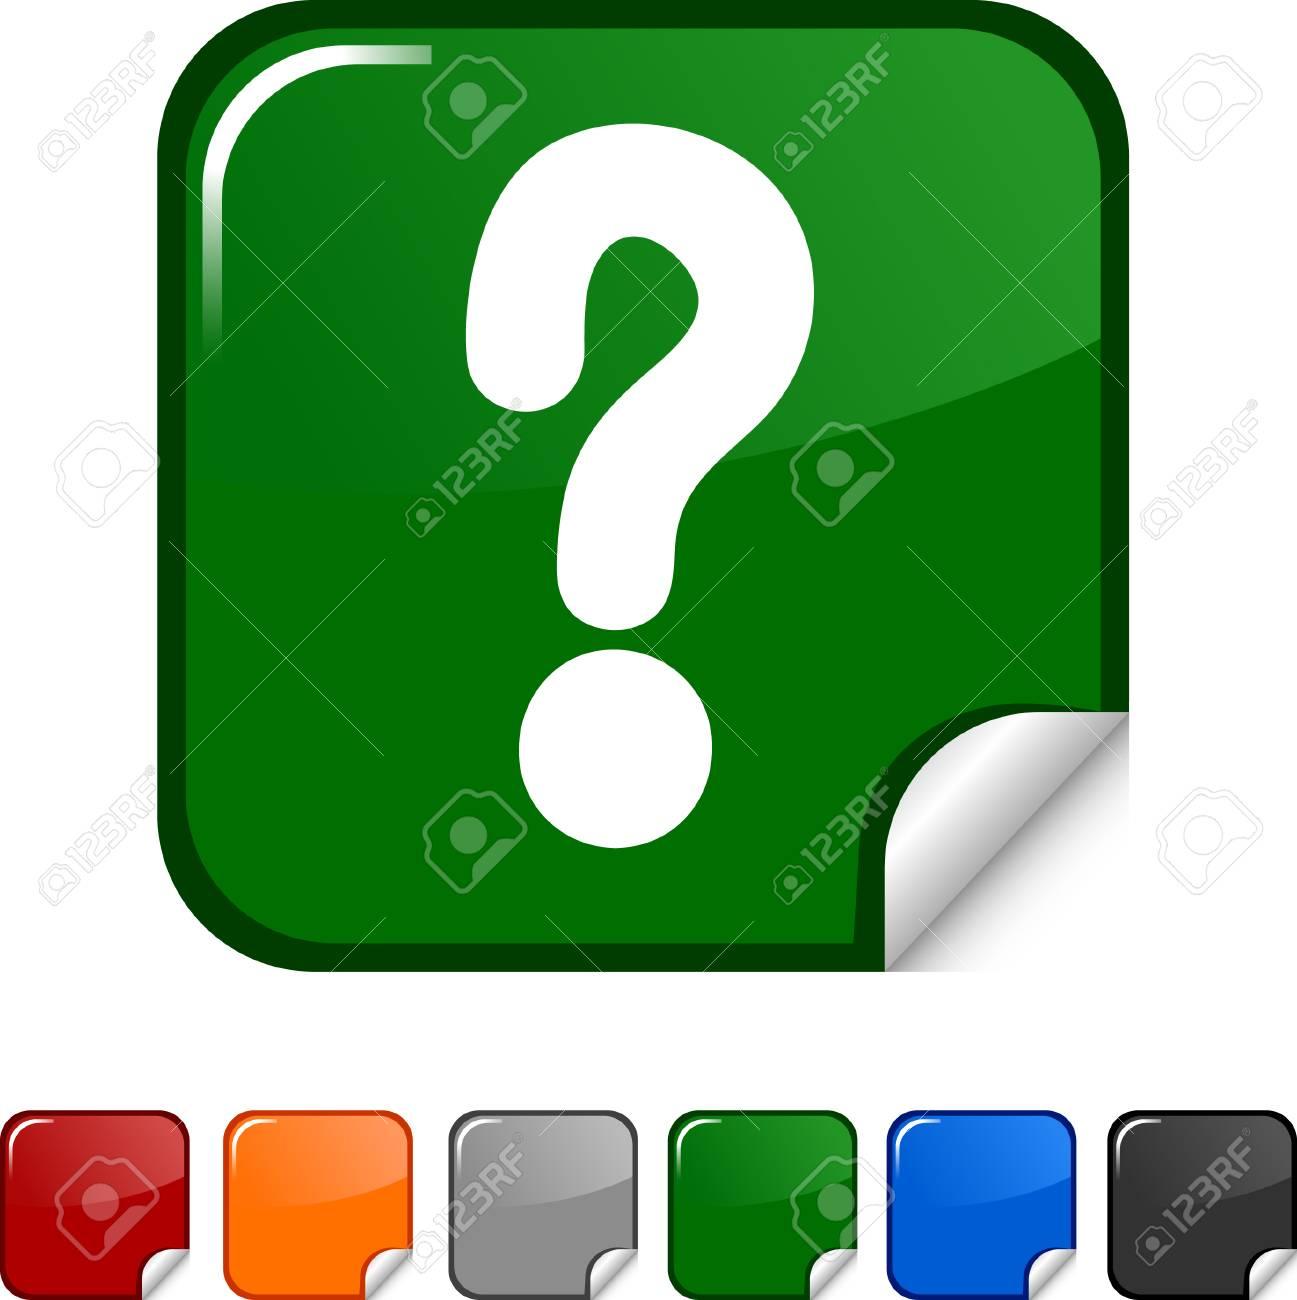 Question  sticker icon. Vector illustration. Stock Vector - 5627959